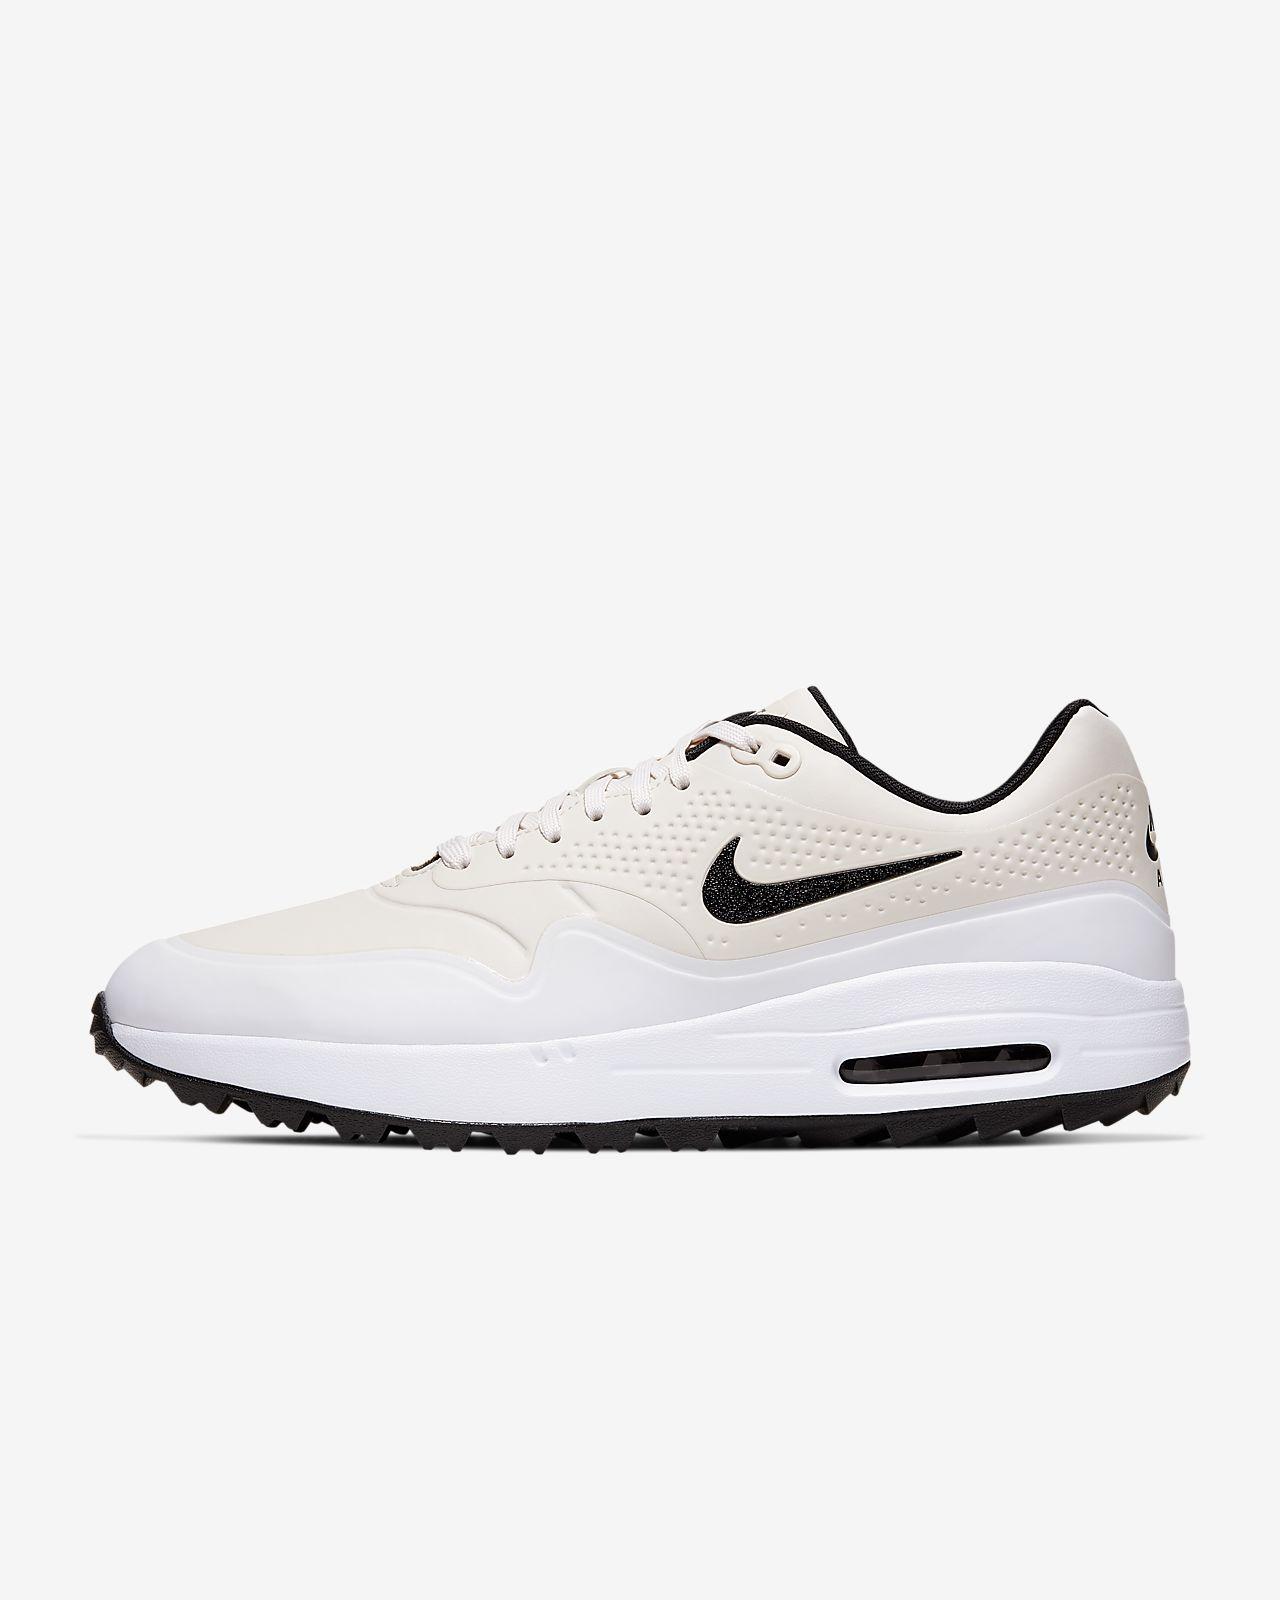 Nike Air Max 1 G Herren-Golfschuh